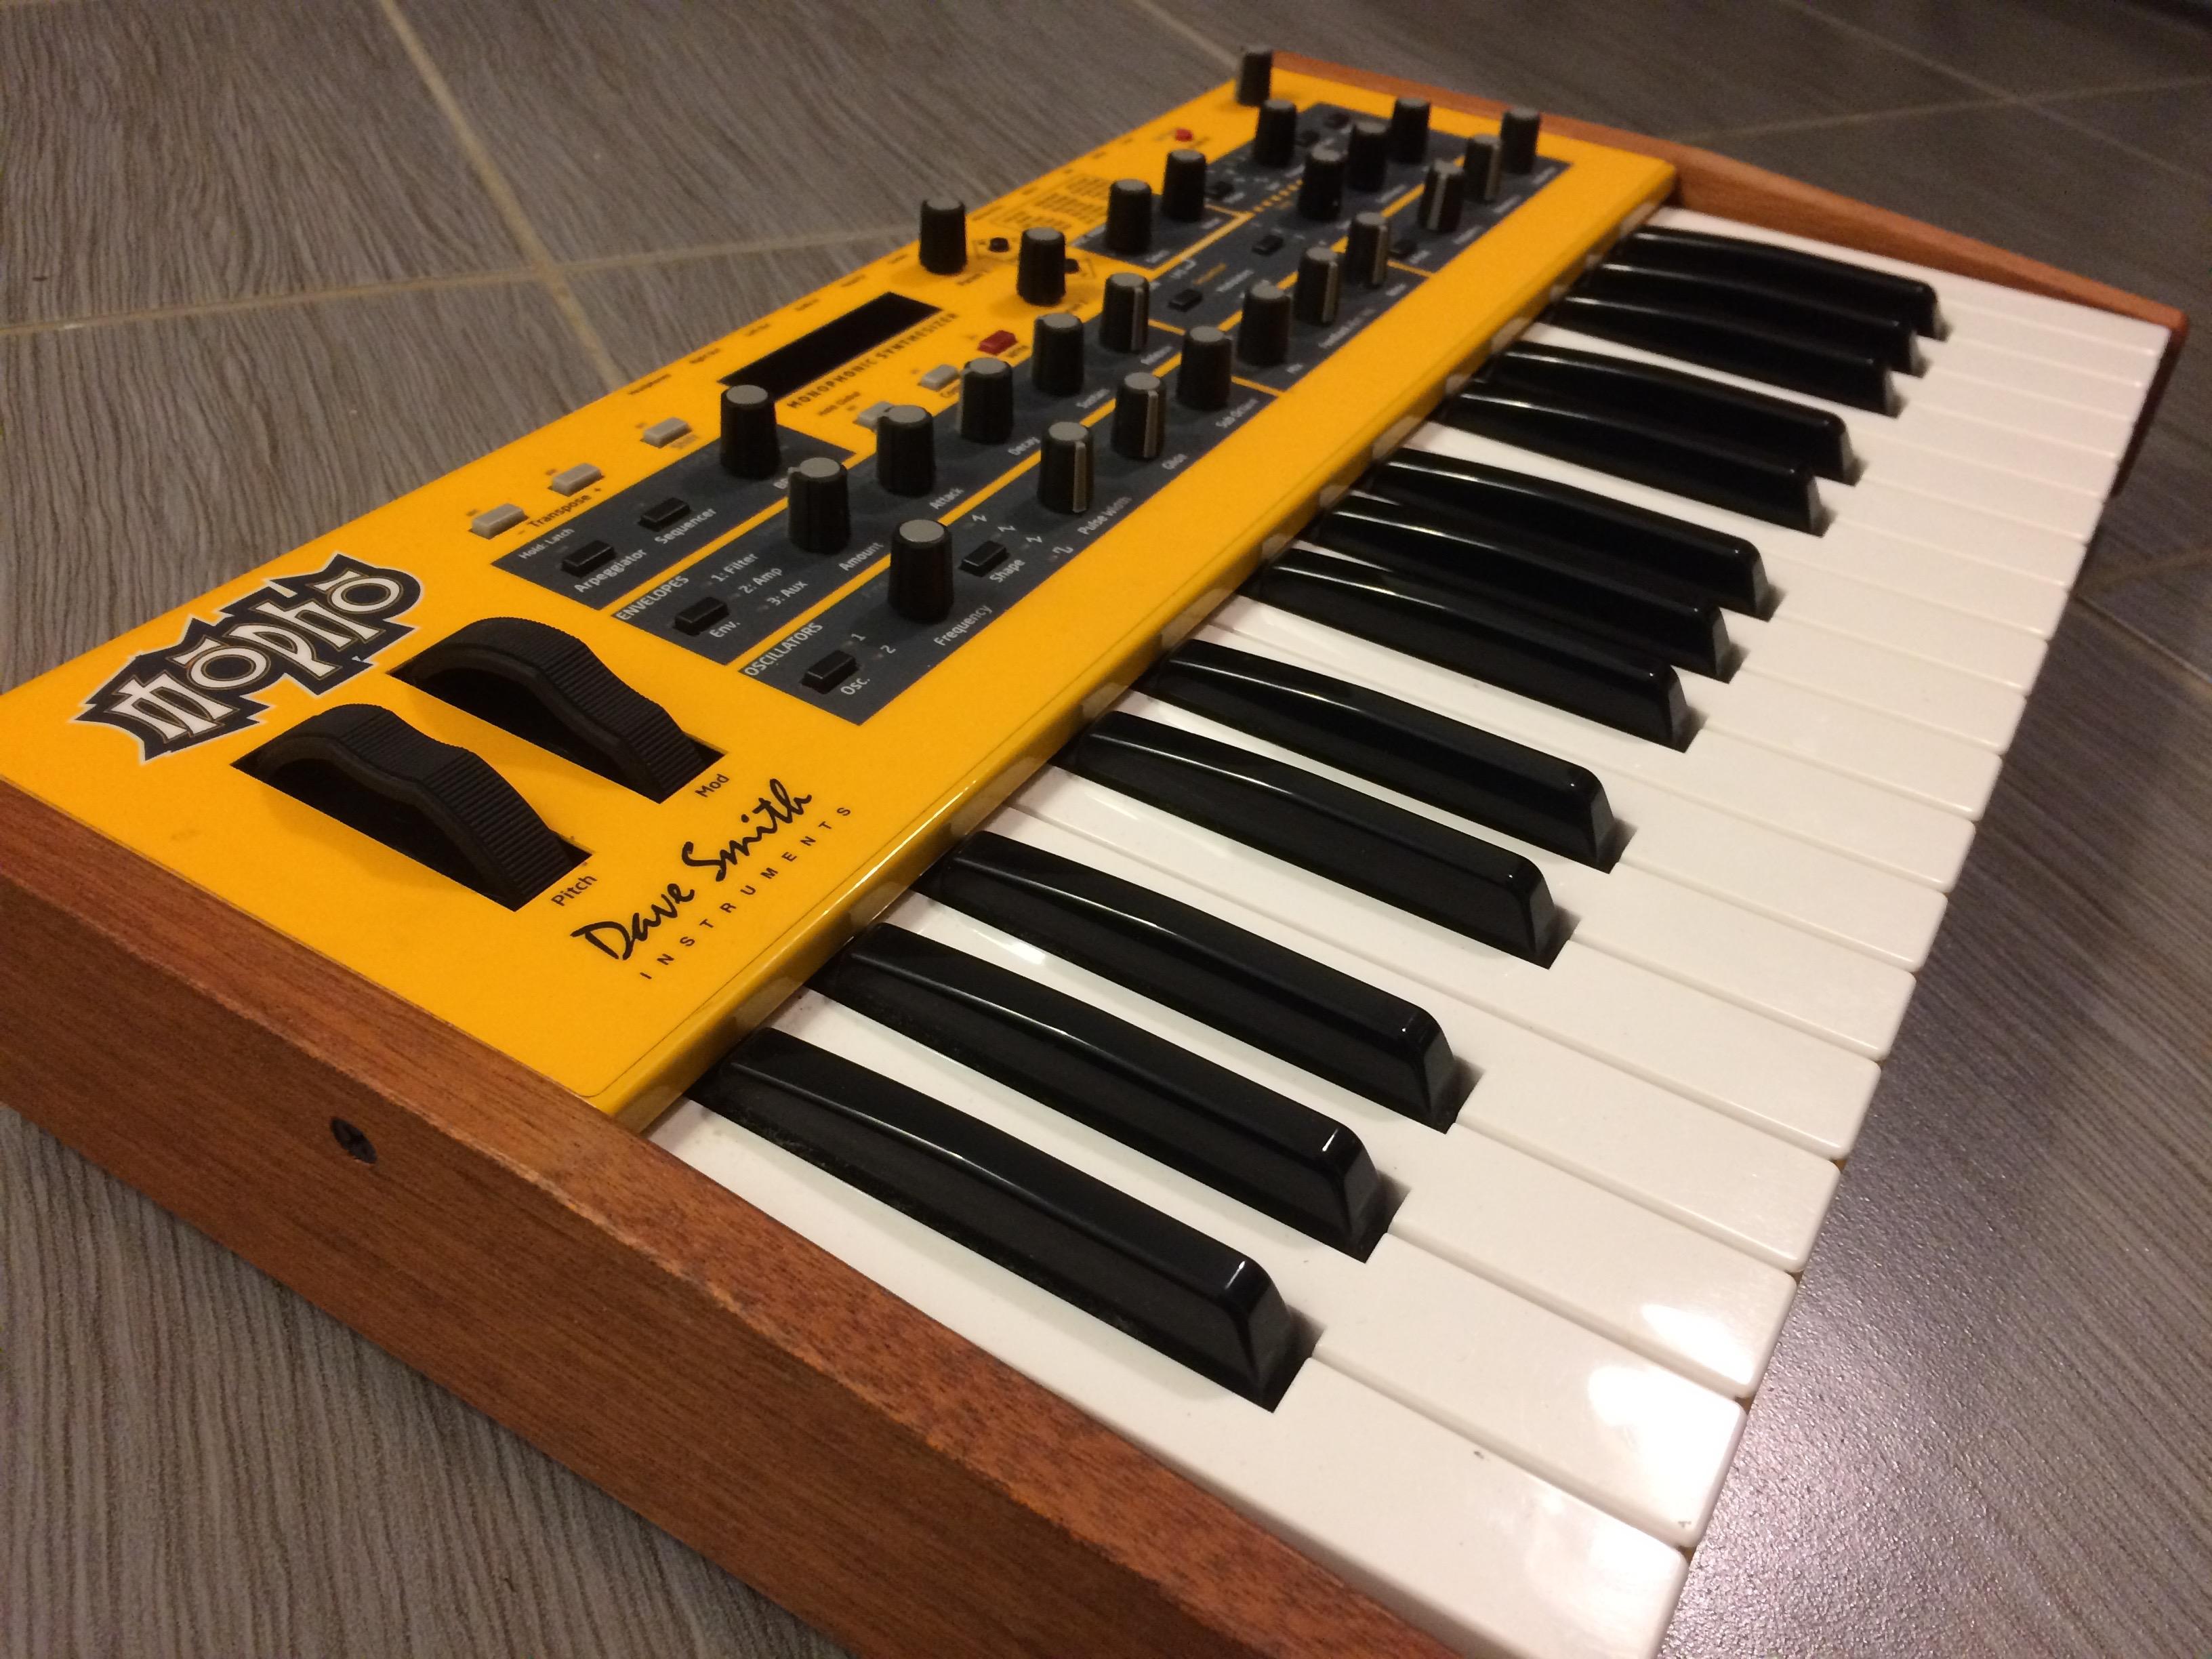 dave smith instruments mopho keyboard image 1672388 audiofanzine. Black Bedroom Furniture Sets. Home Design Ideas